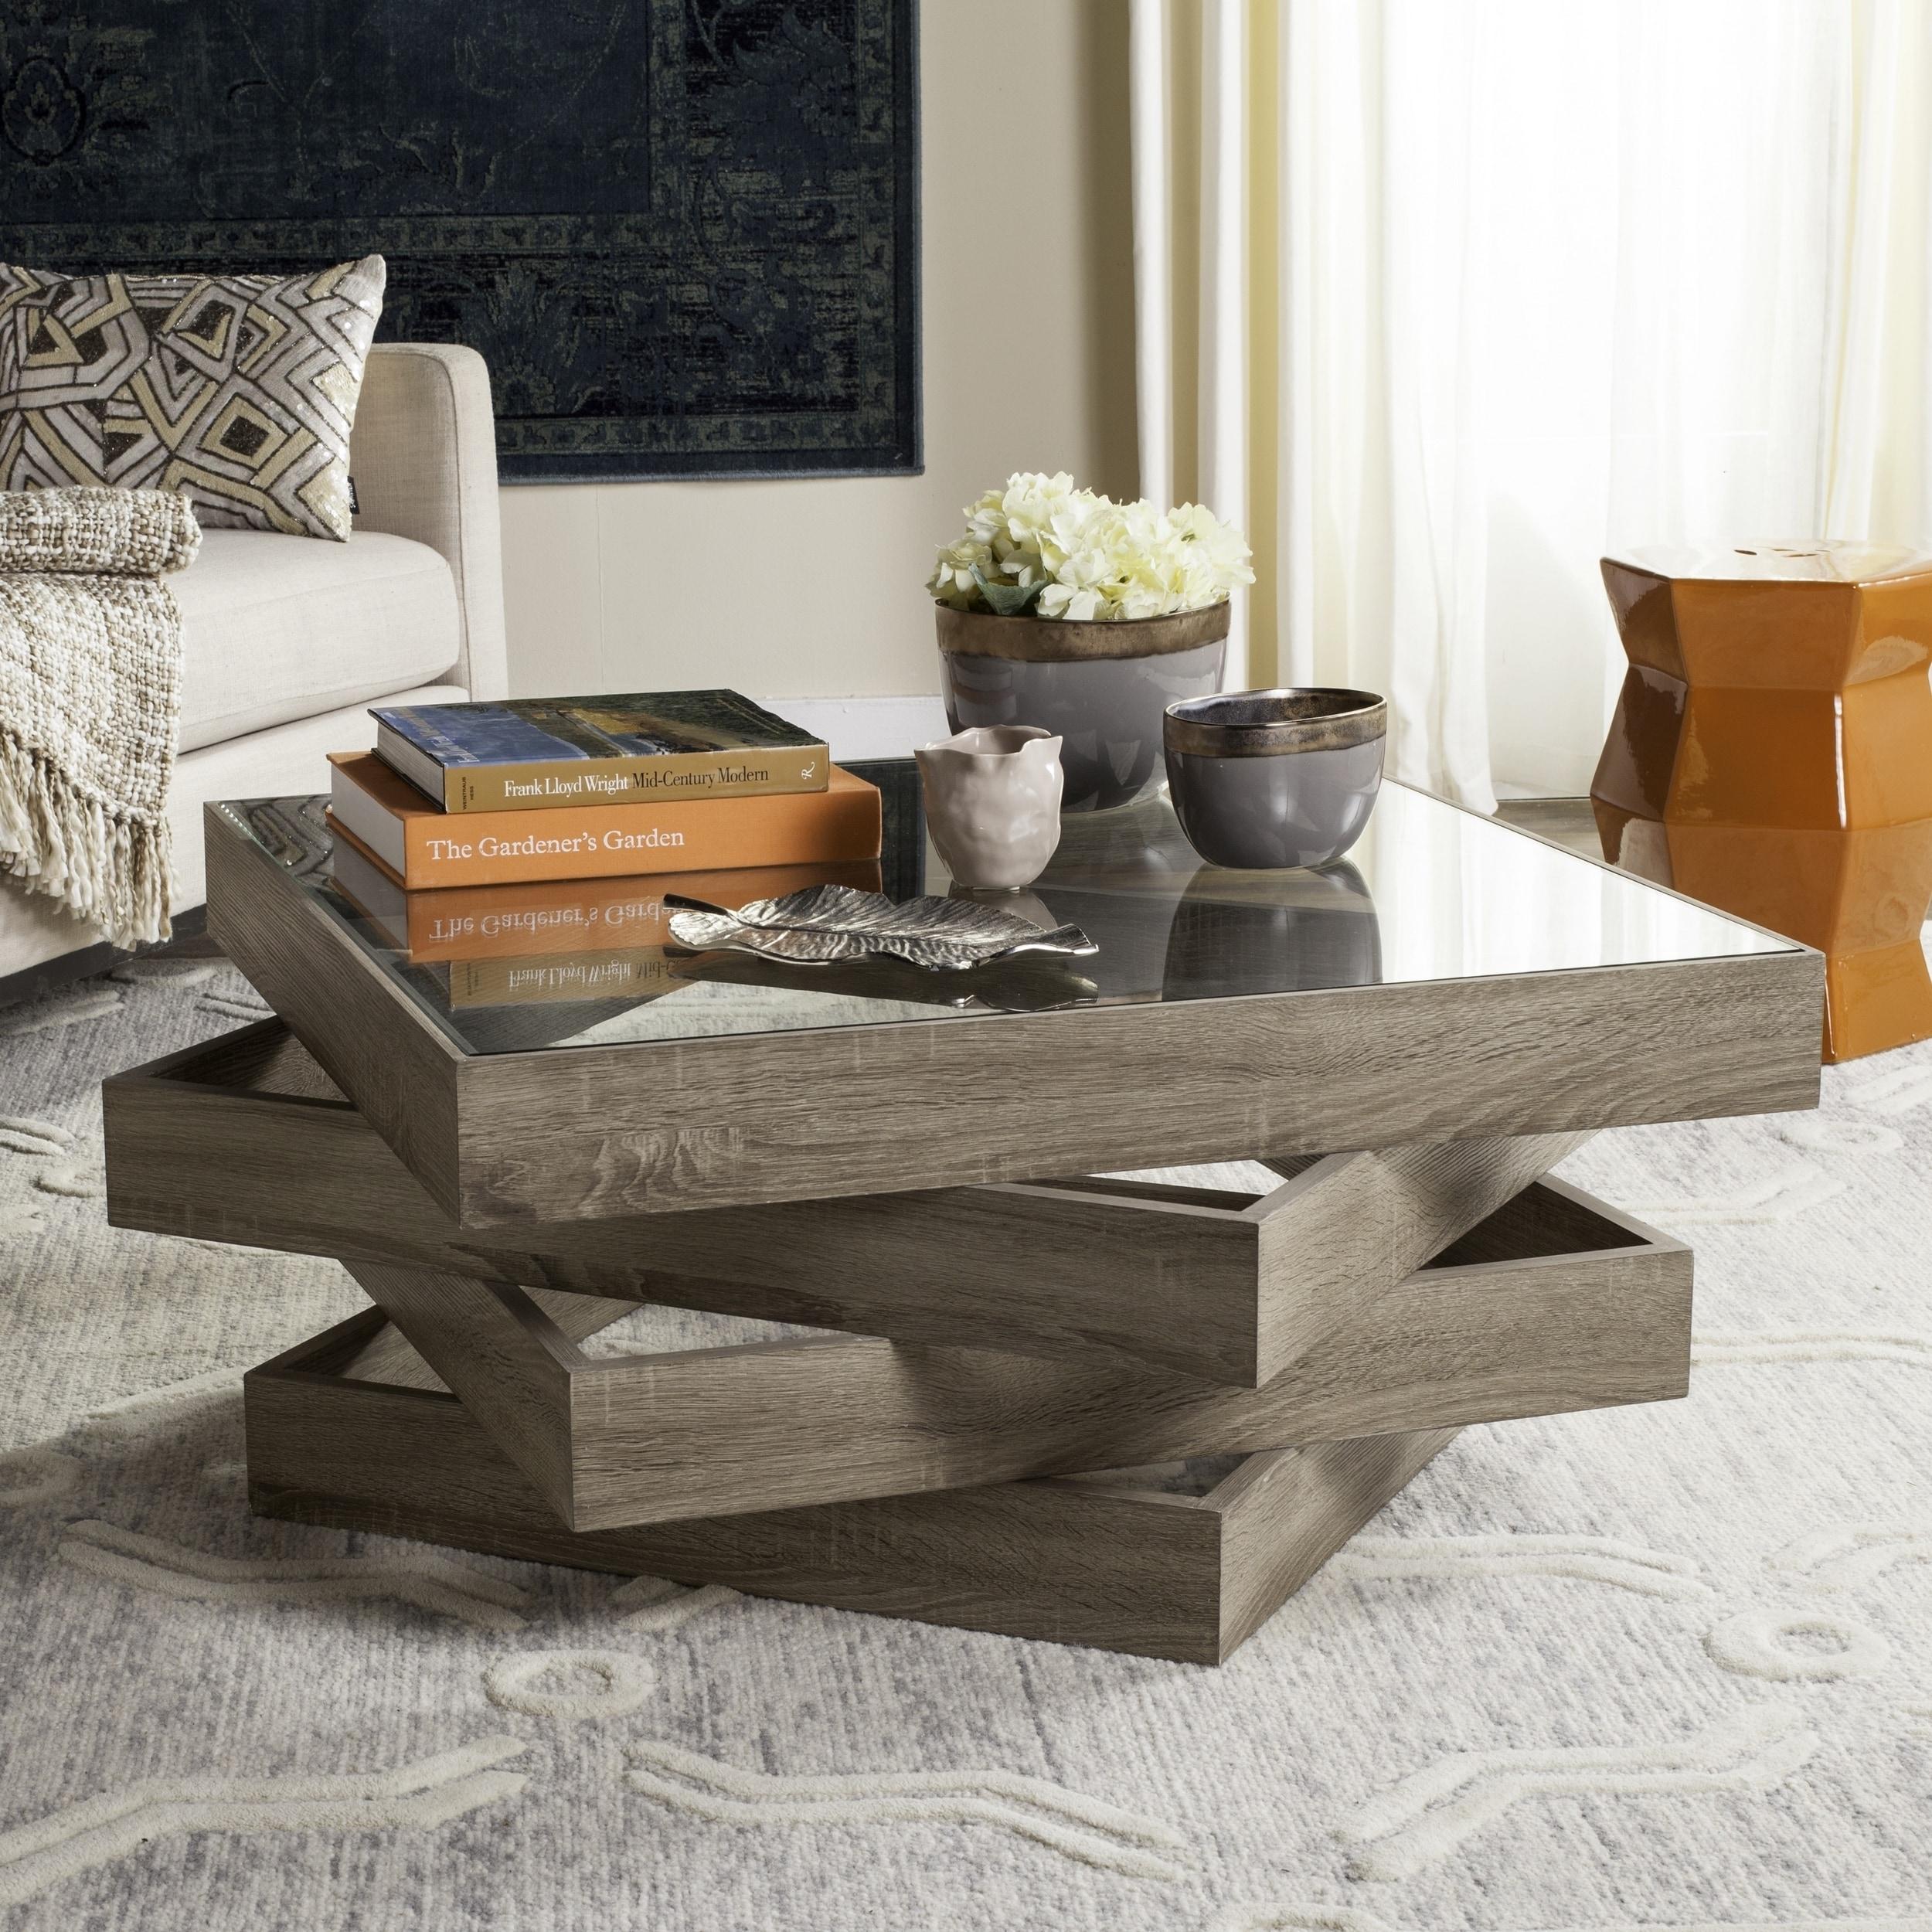 Wondrous Safavieh Anwen Geometric Wood Coffee Table 33 5 X 33 5 X 15 8 Cjindustries Chair Design For Home Cjindustriesco